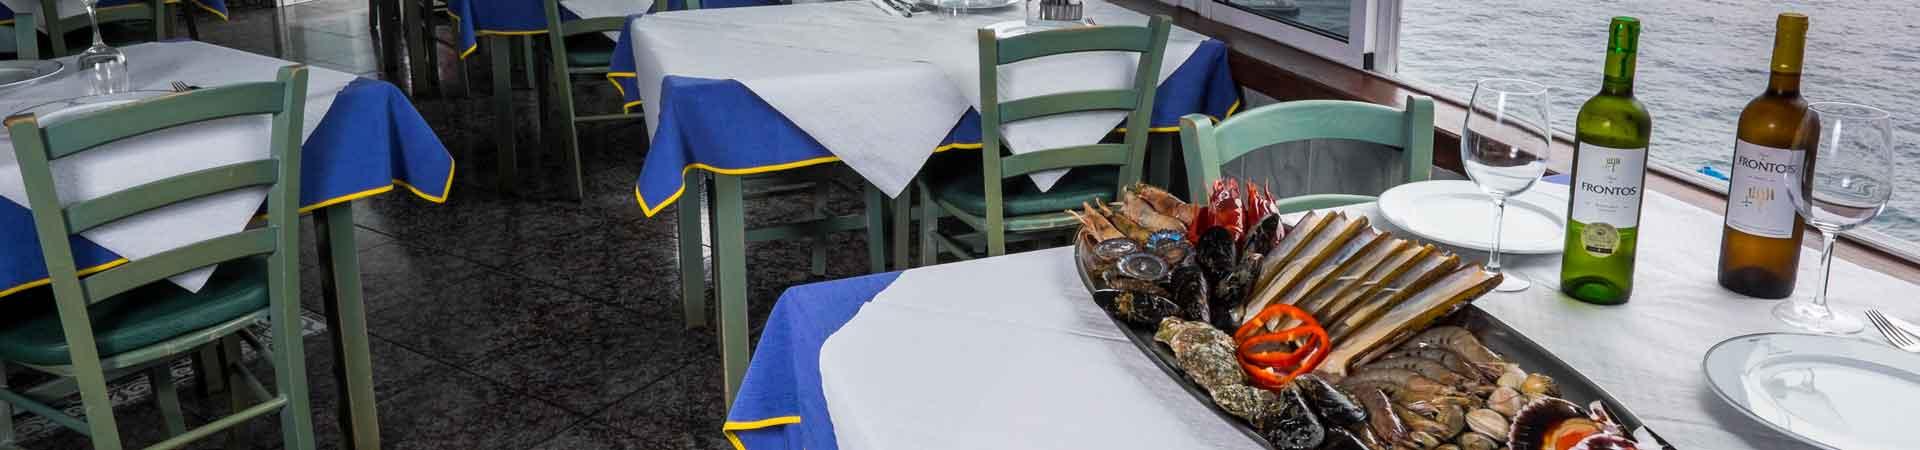 https://www.goodmorningtenerife.com/wp-content/uploads/2015/10/04_slide_restaurante-los-abrigos-1920x450-1.jpg